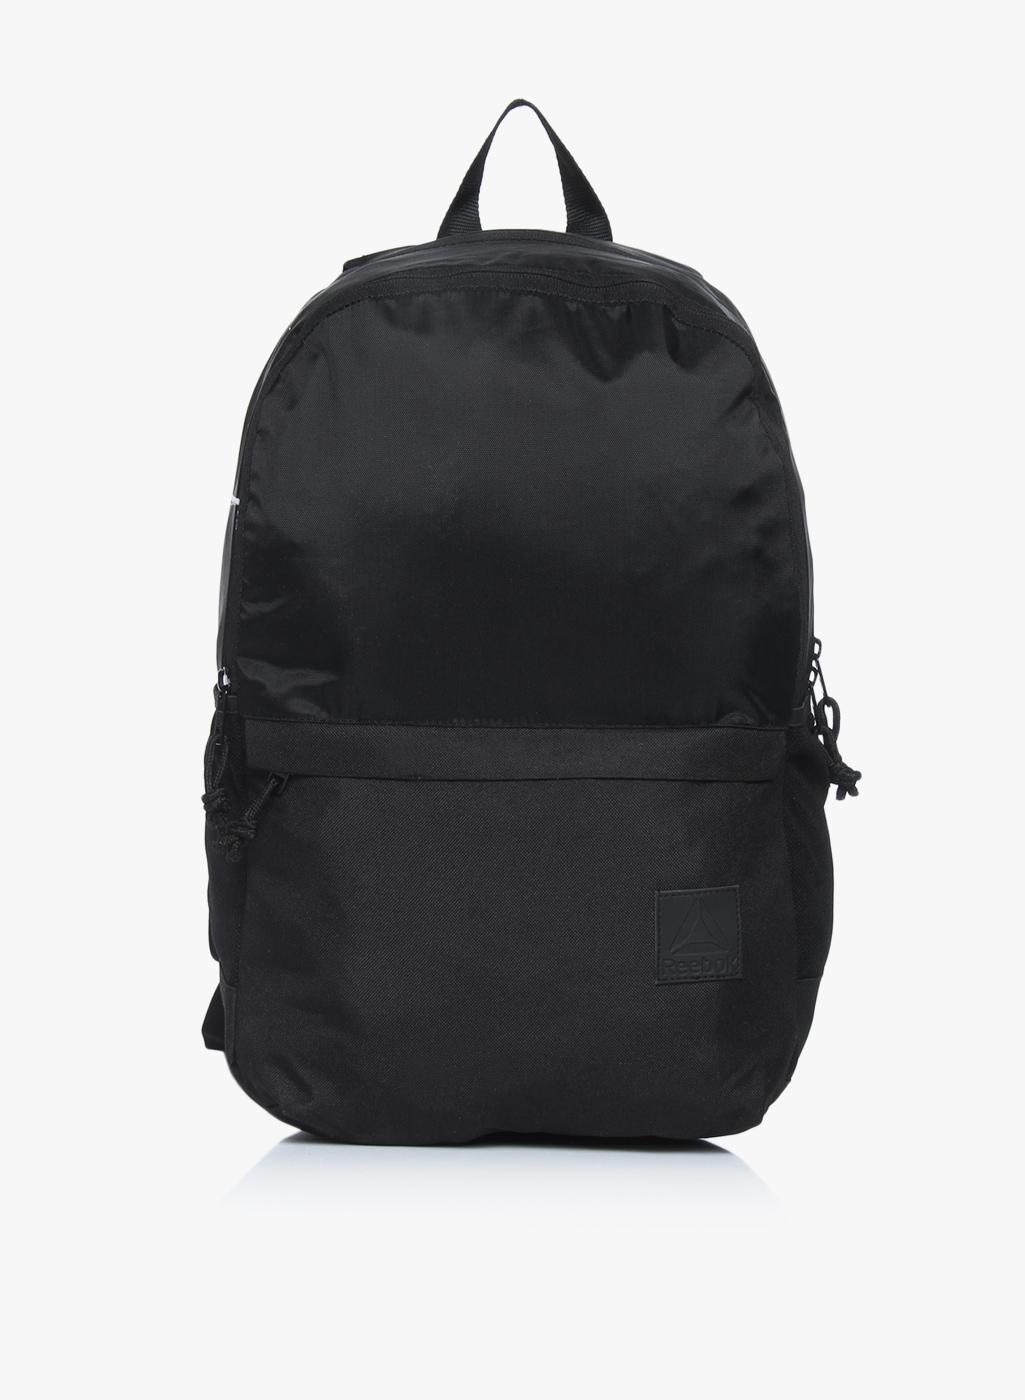 Women Reebok Bag - Buy Women Reebok Bag online in India